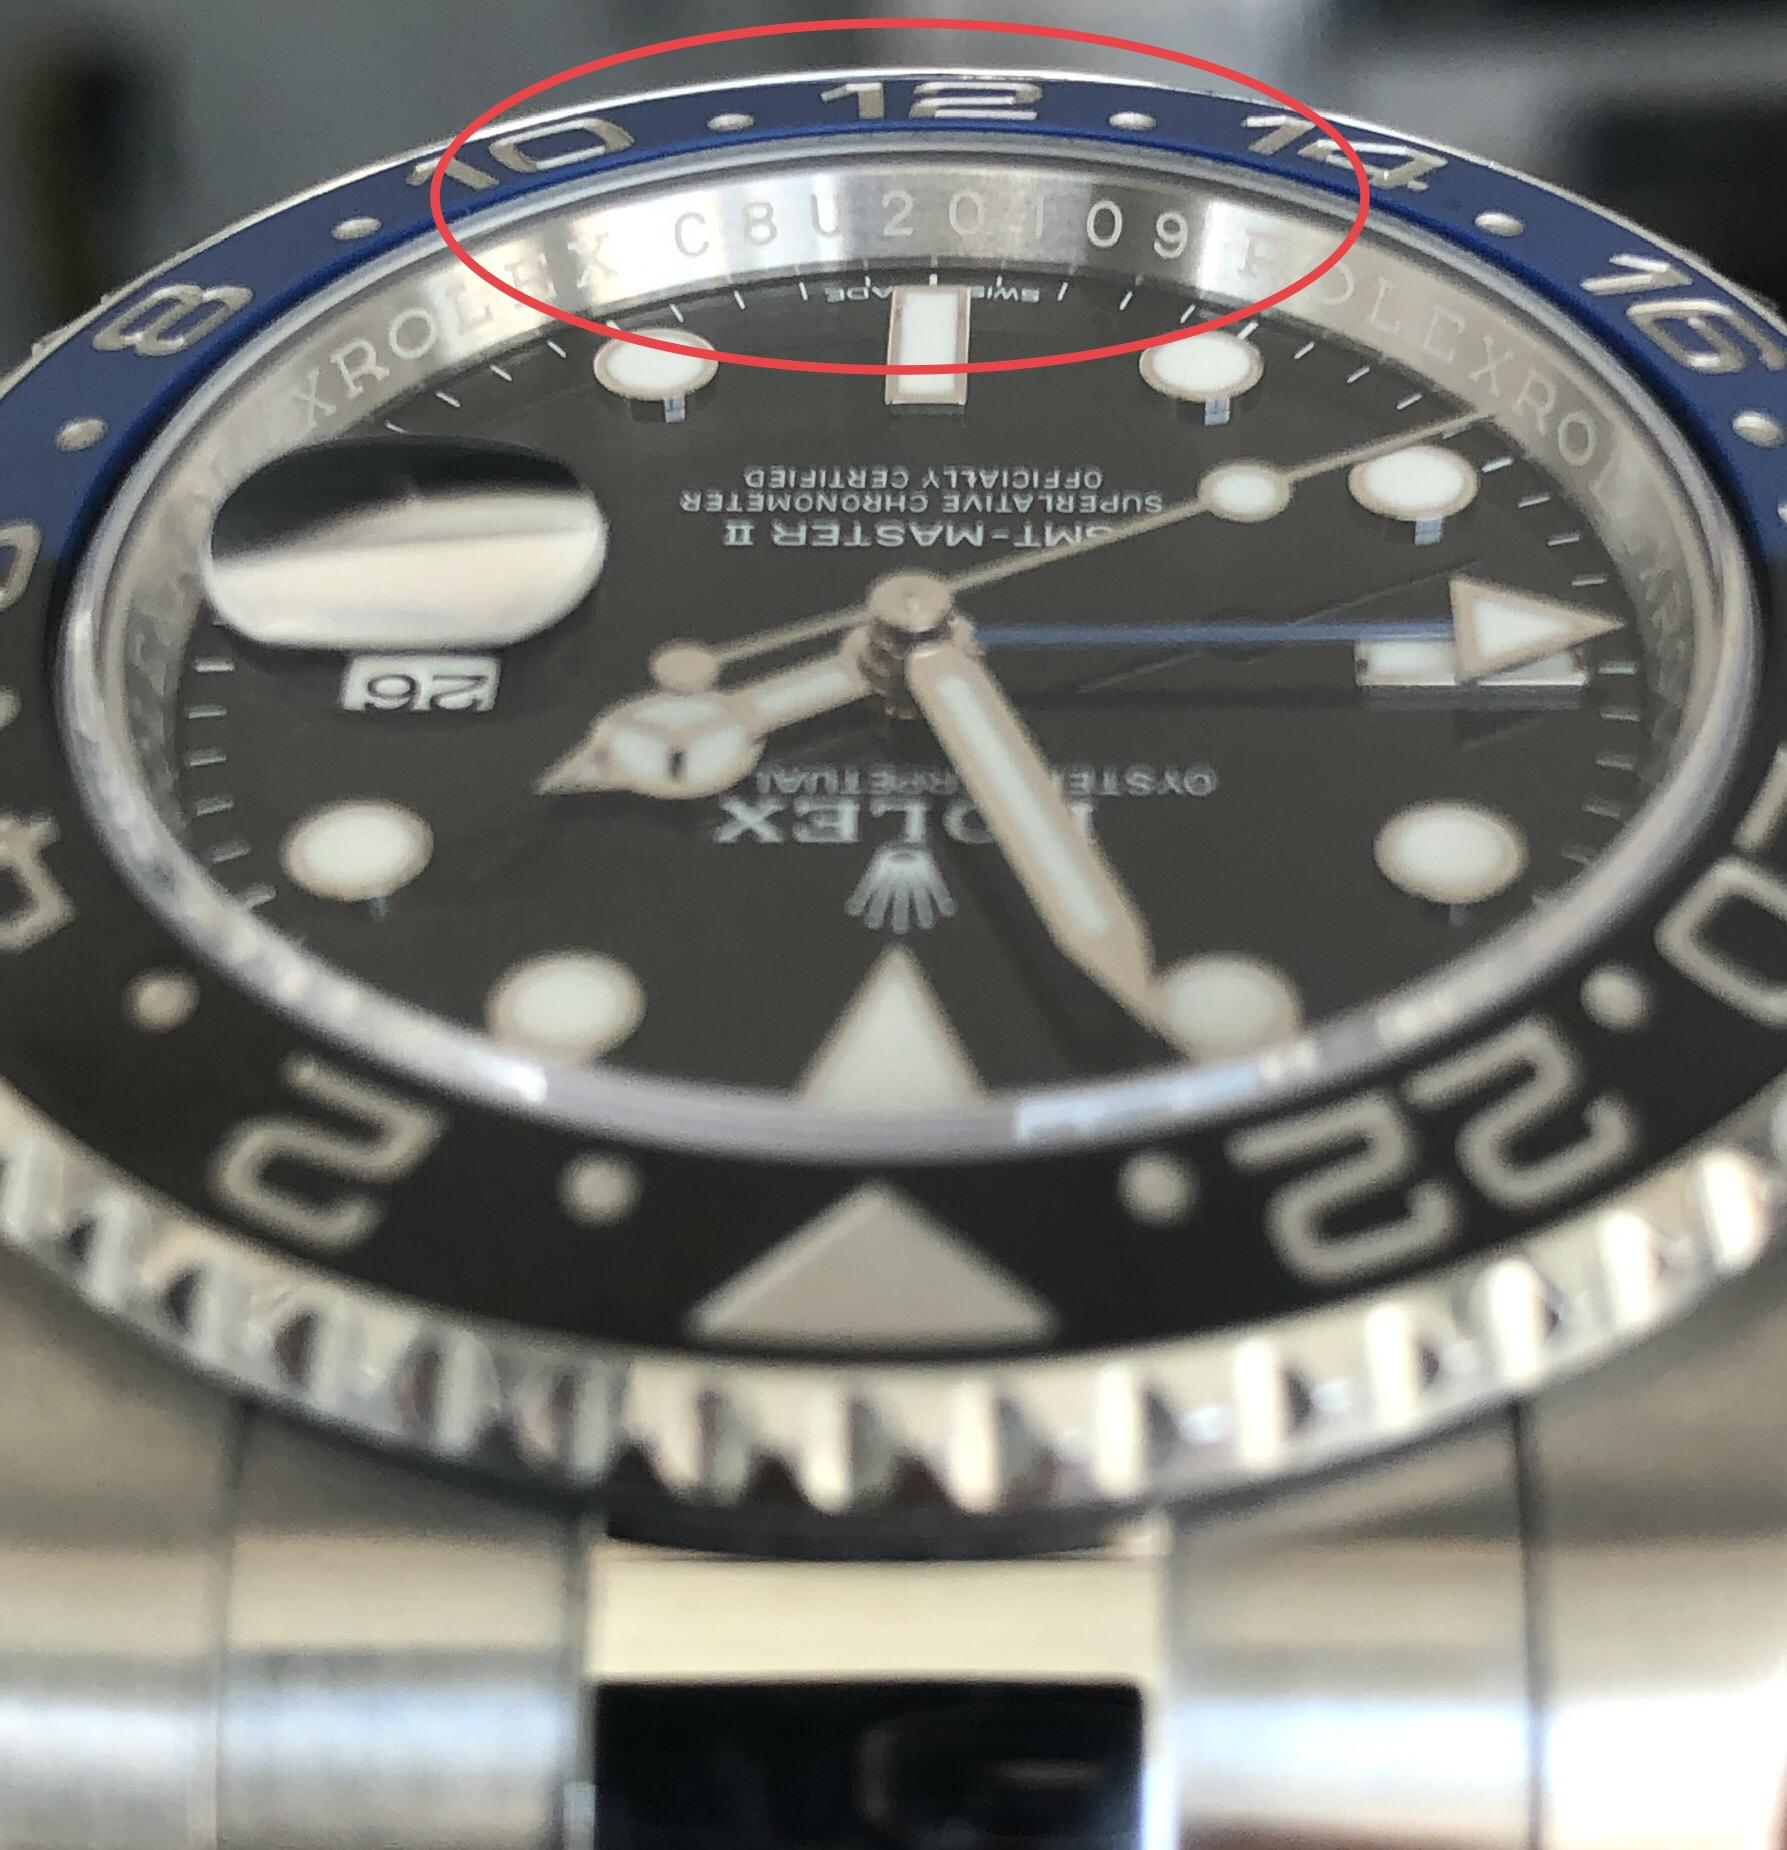 Rolex Serial Number Lookup